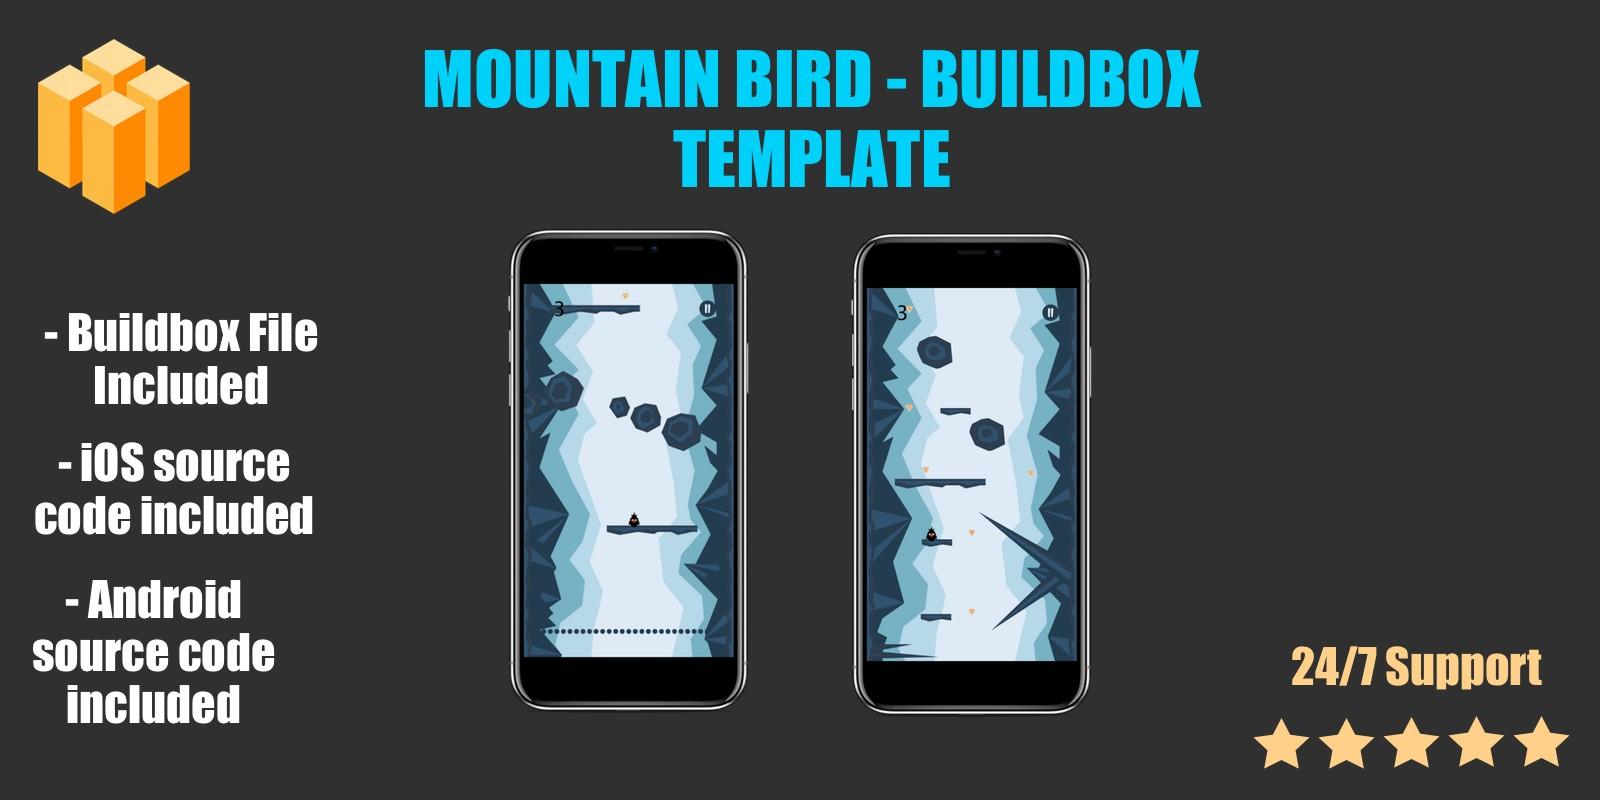 Mountain Bird - Buildbox Template